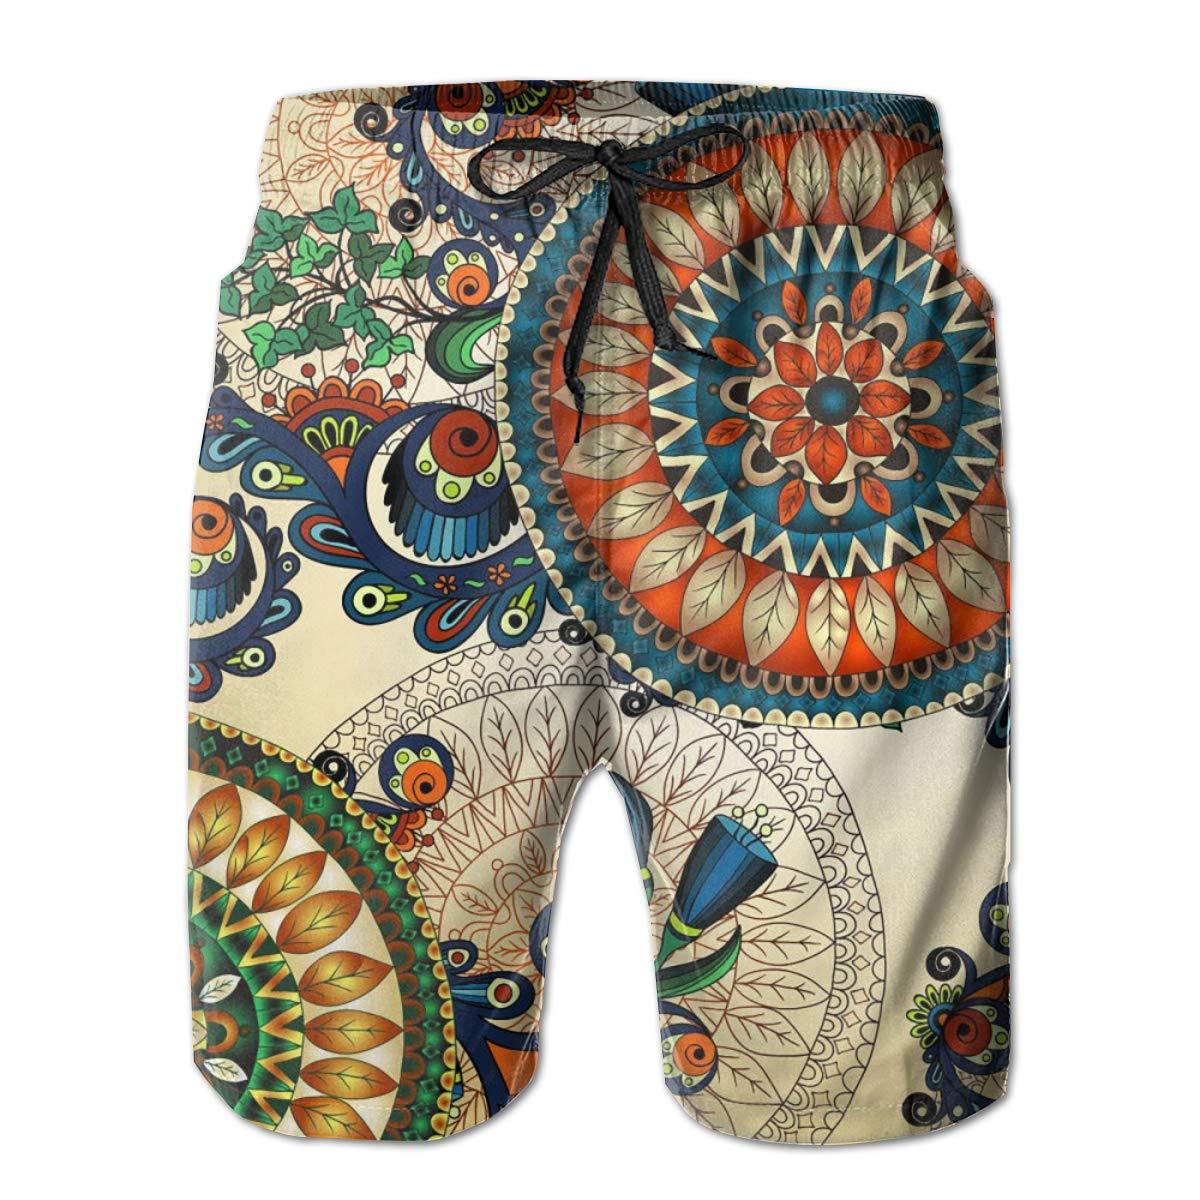 Airealy Men/'s Summer Beach Trunks Tribal Nation Totem Drawstring Elastic Waist Quick Dry Swim Short Pants